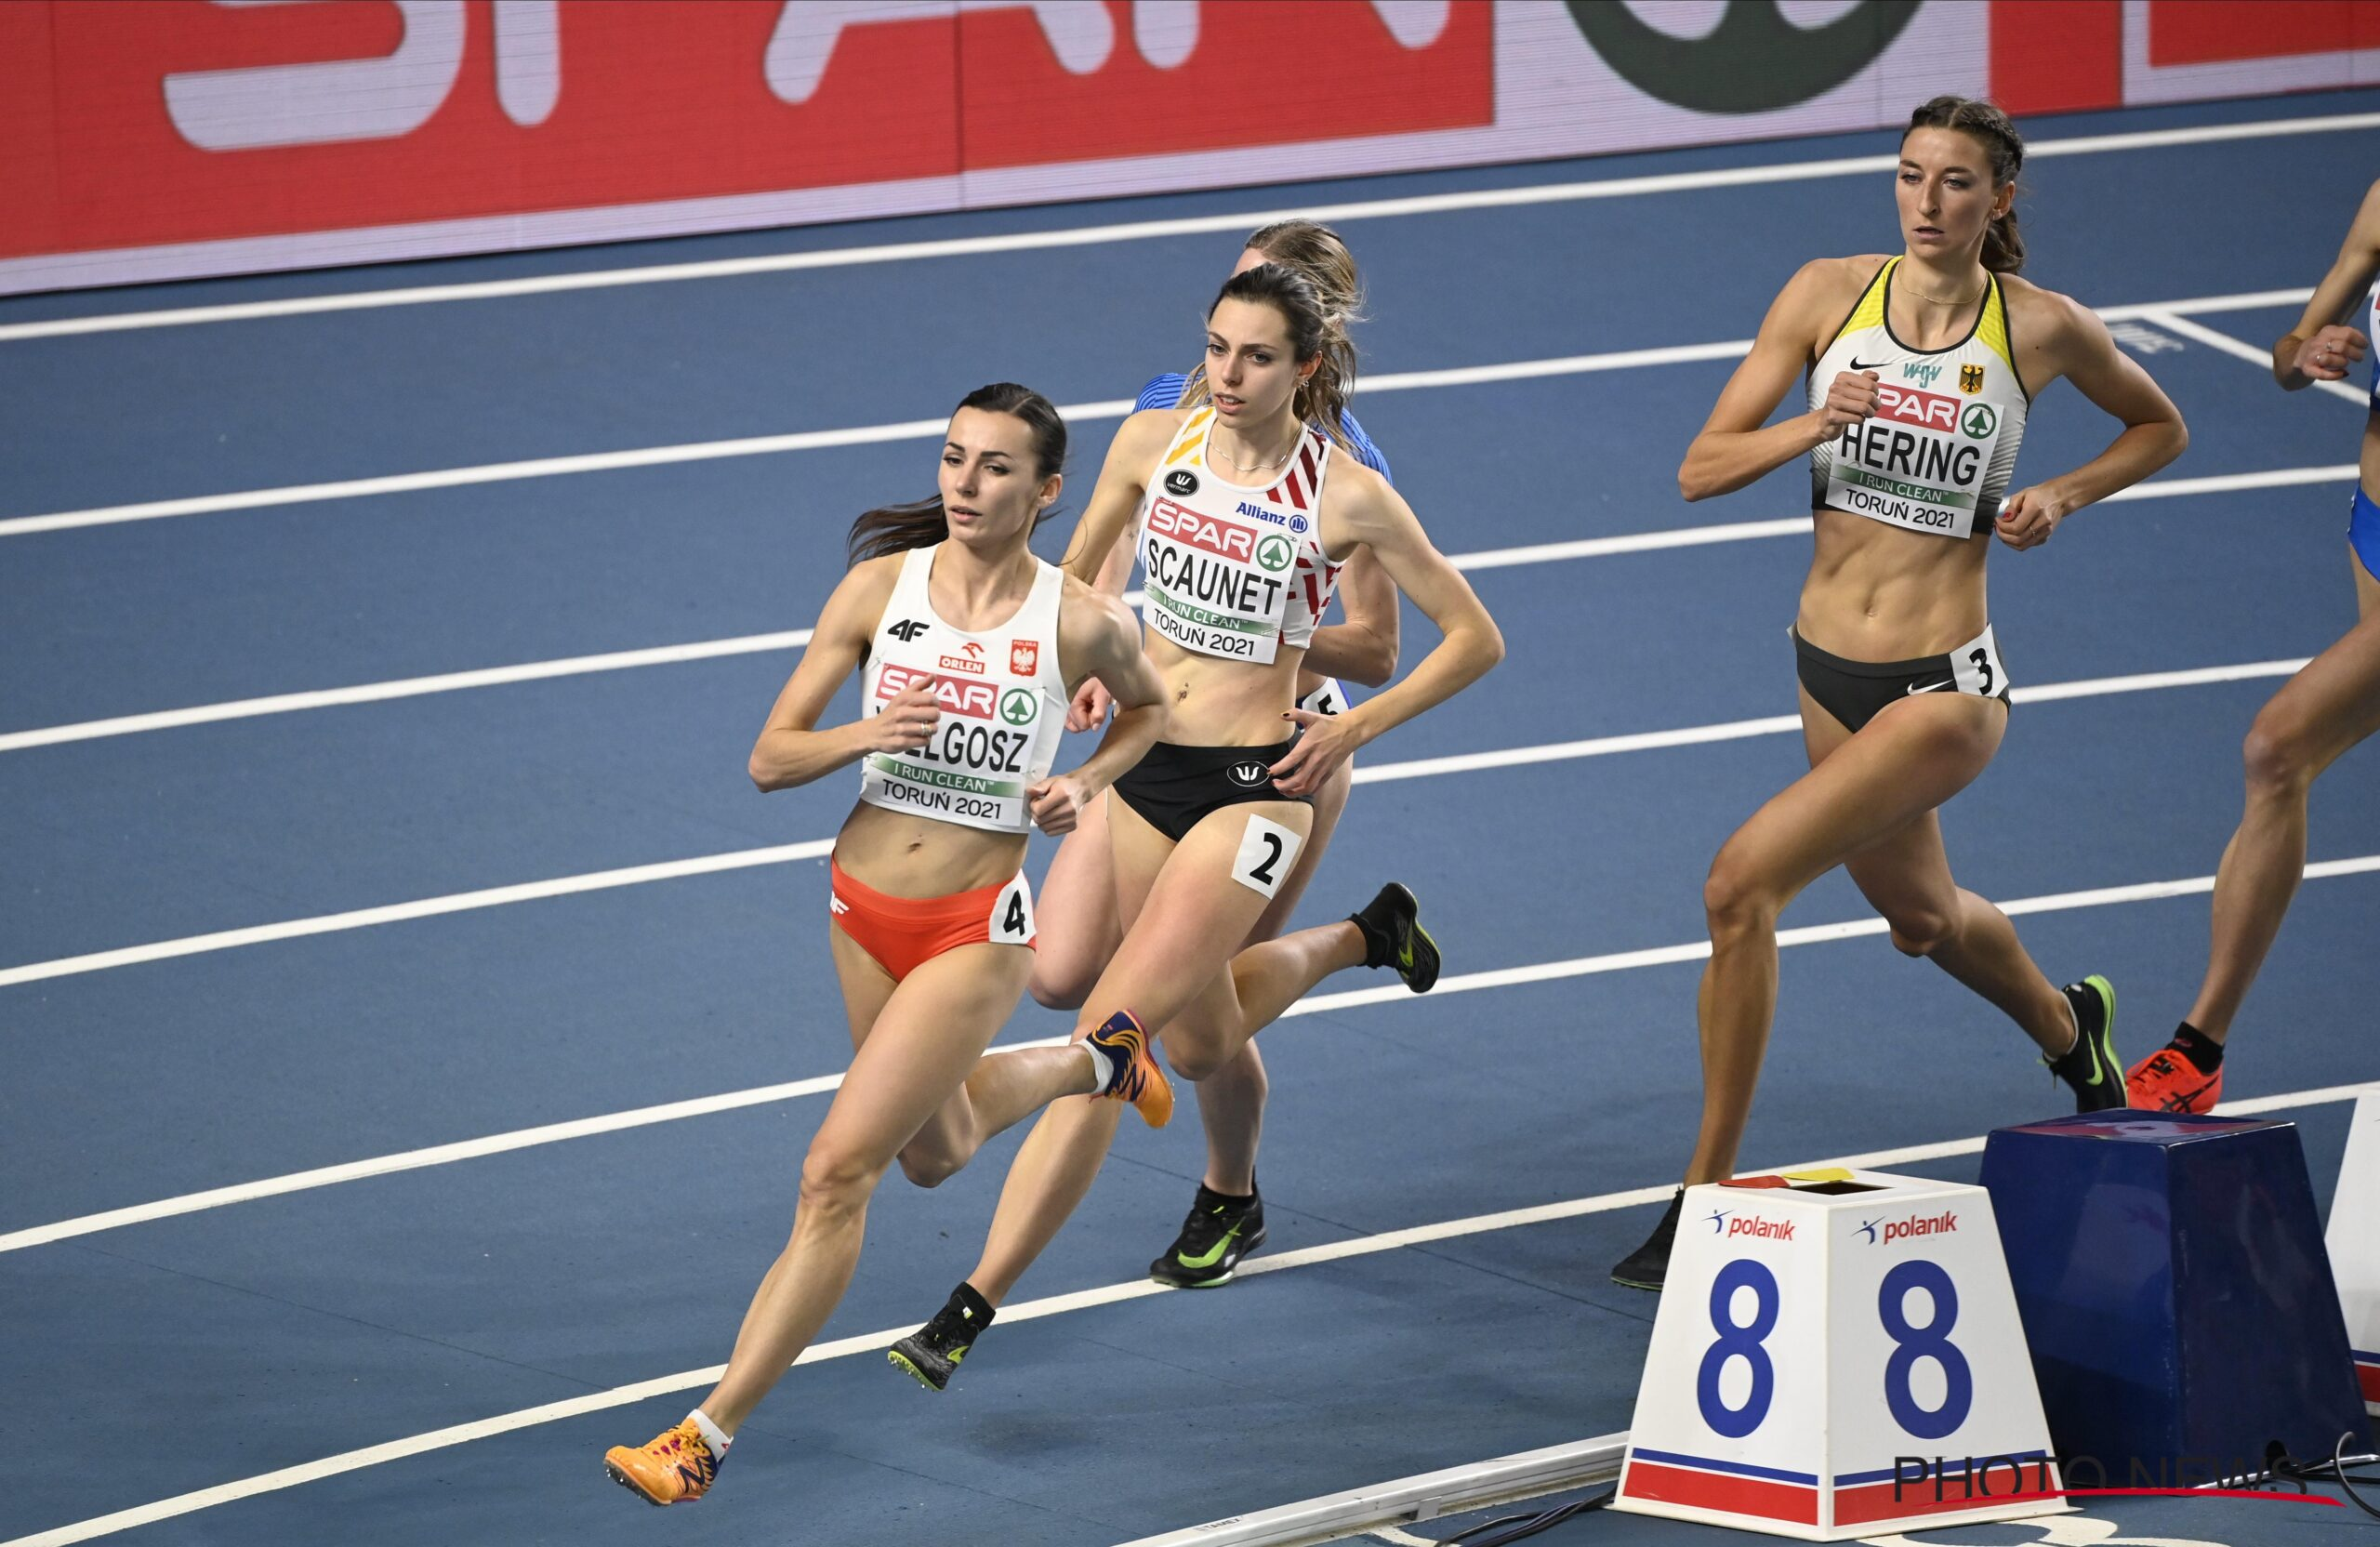 INSCYD user and short distance runner Vanessa Scaunet during The European Championships Indoor on Torun 2021 in Torun